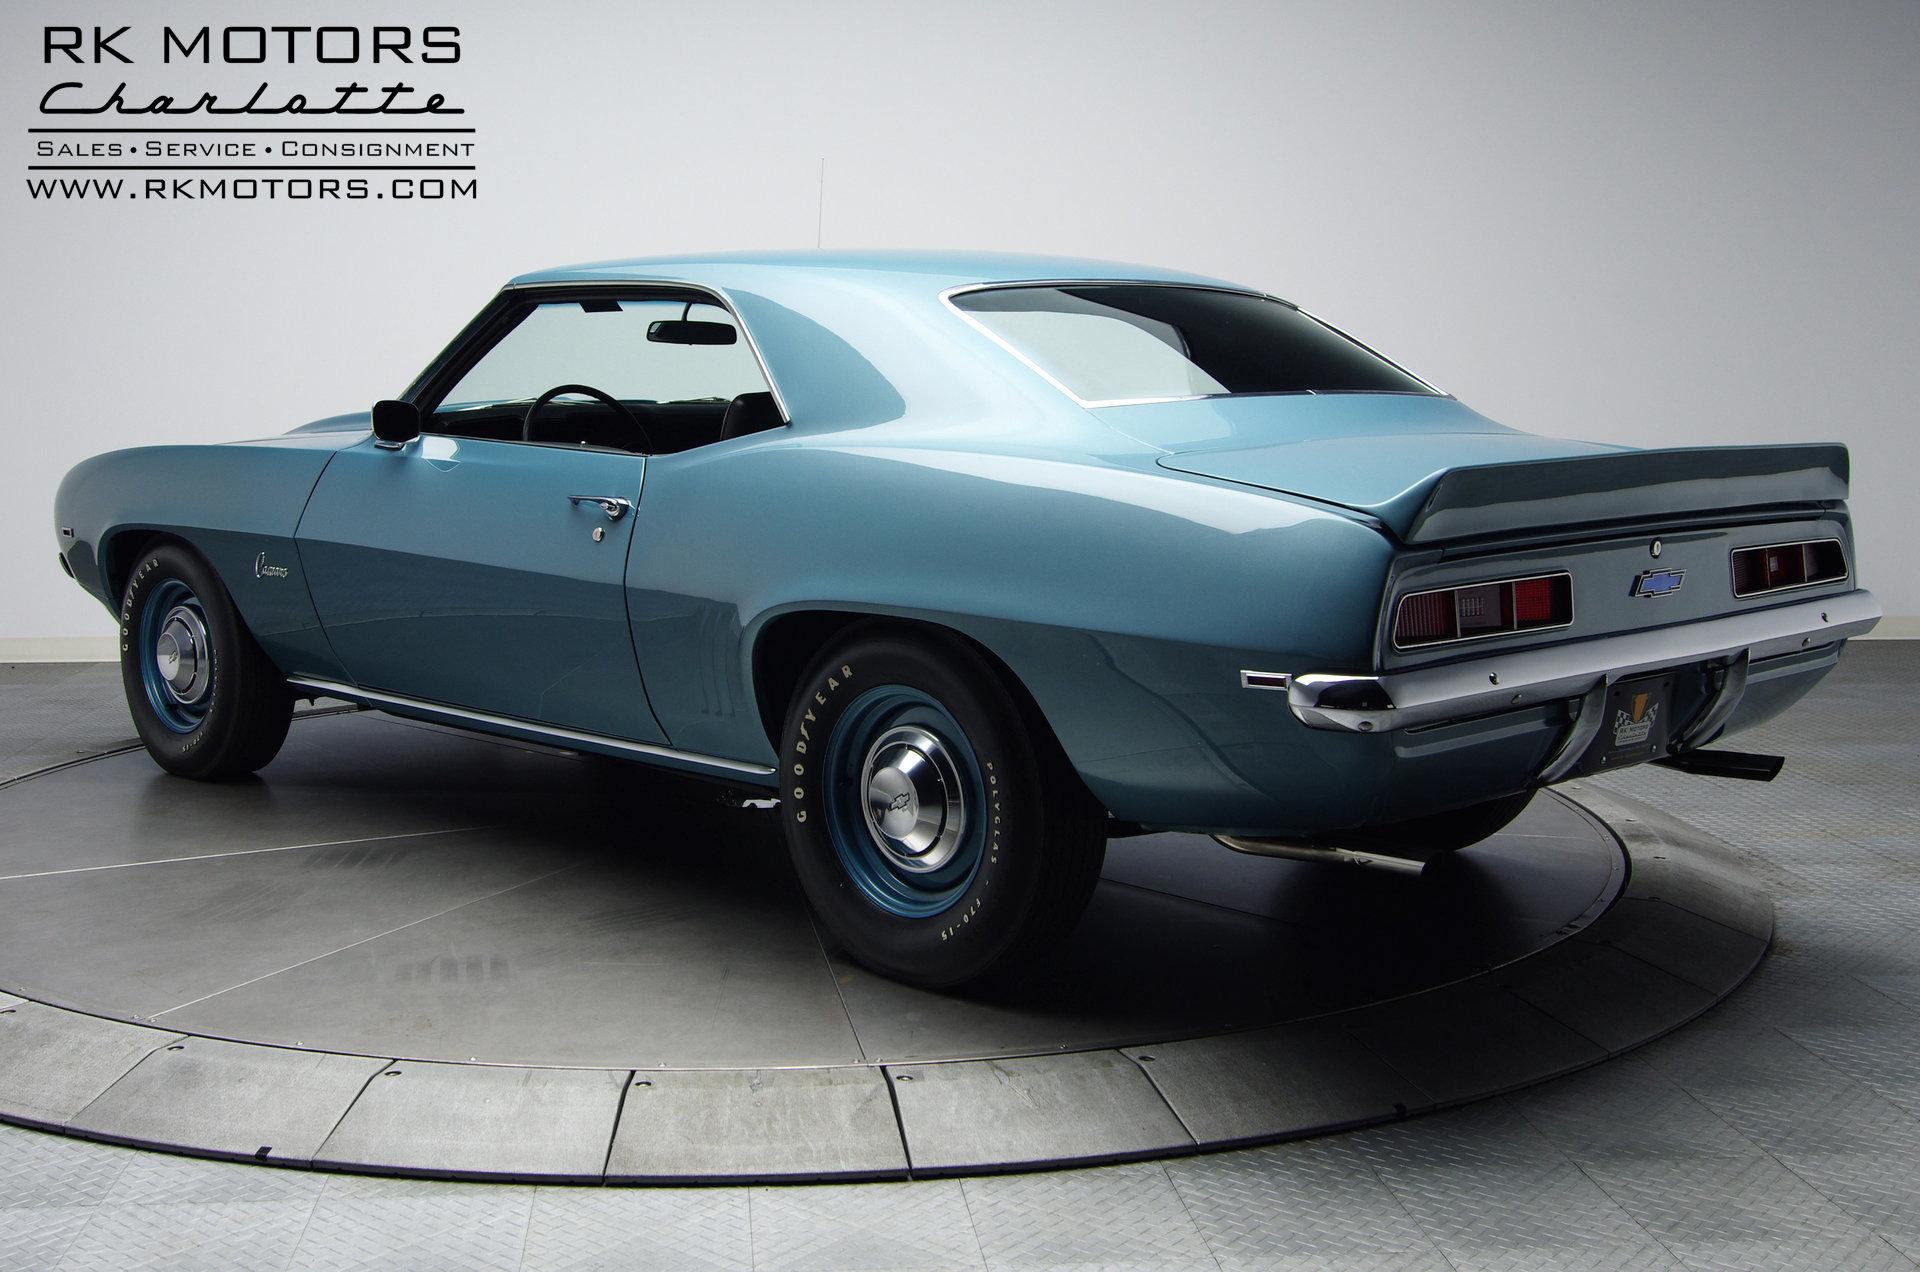 132495 1969 Chevrolet Camaro Rk Motors Classic Cars For Sale